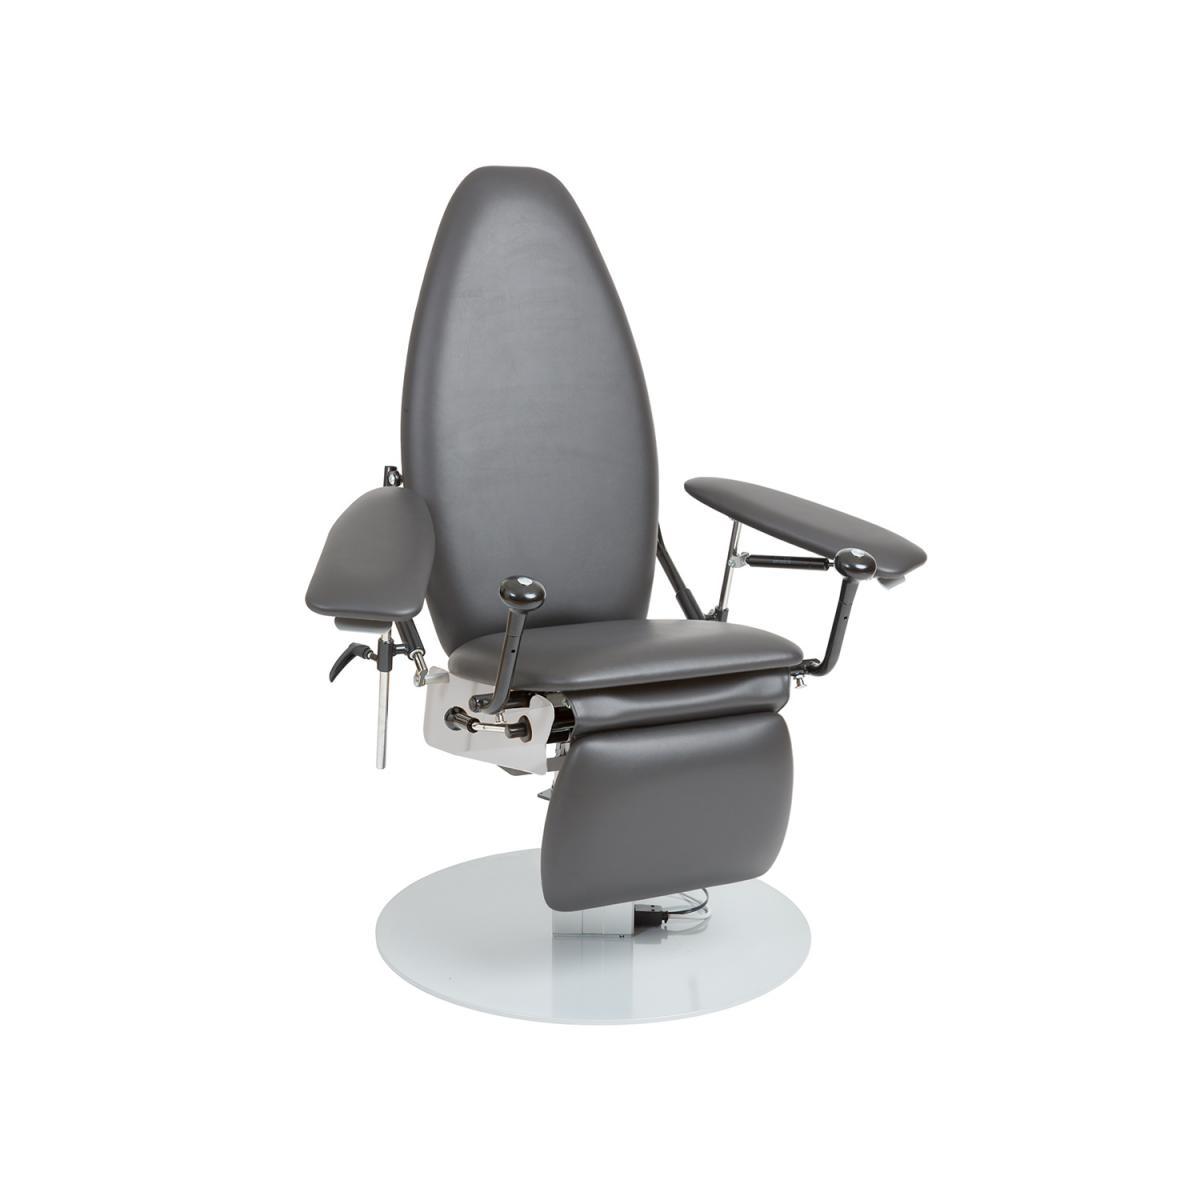 Sampling chair 510